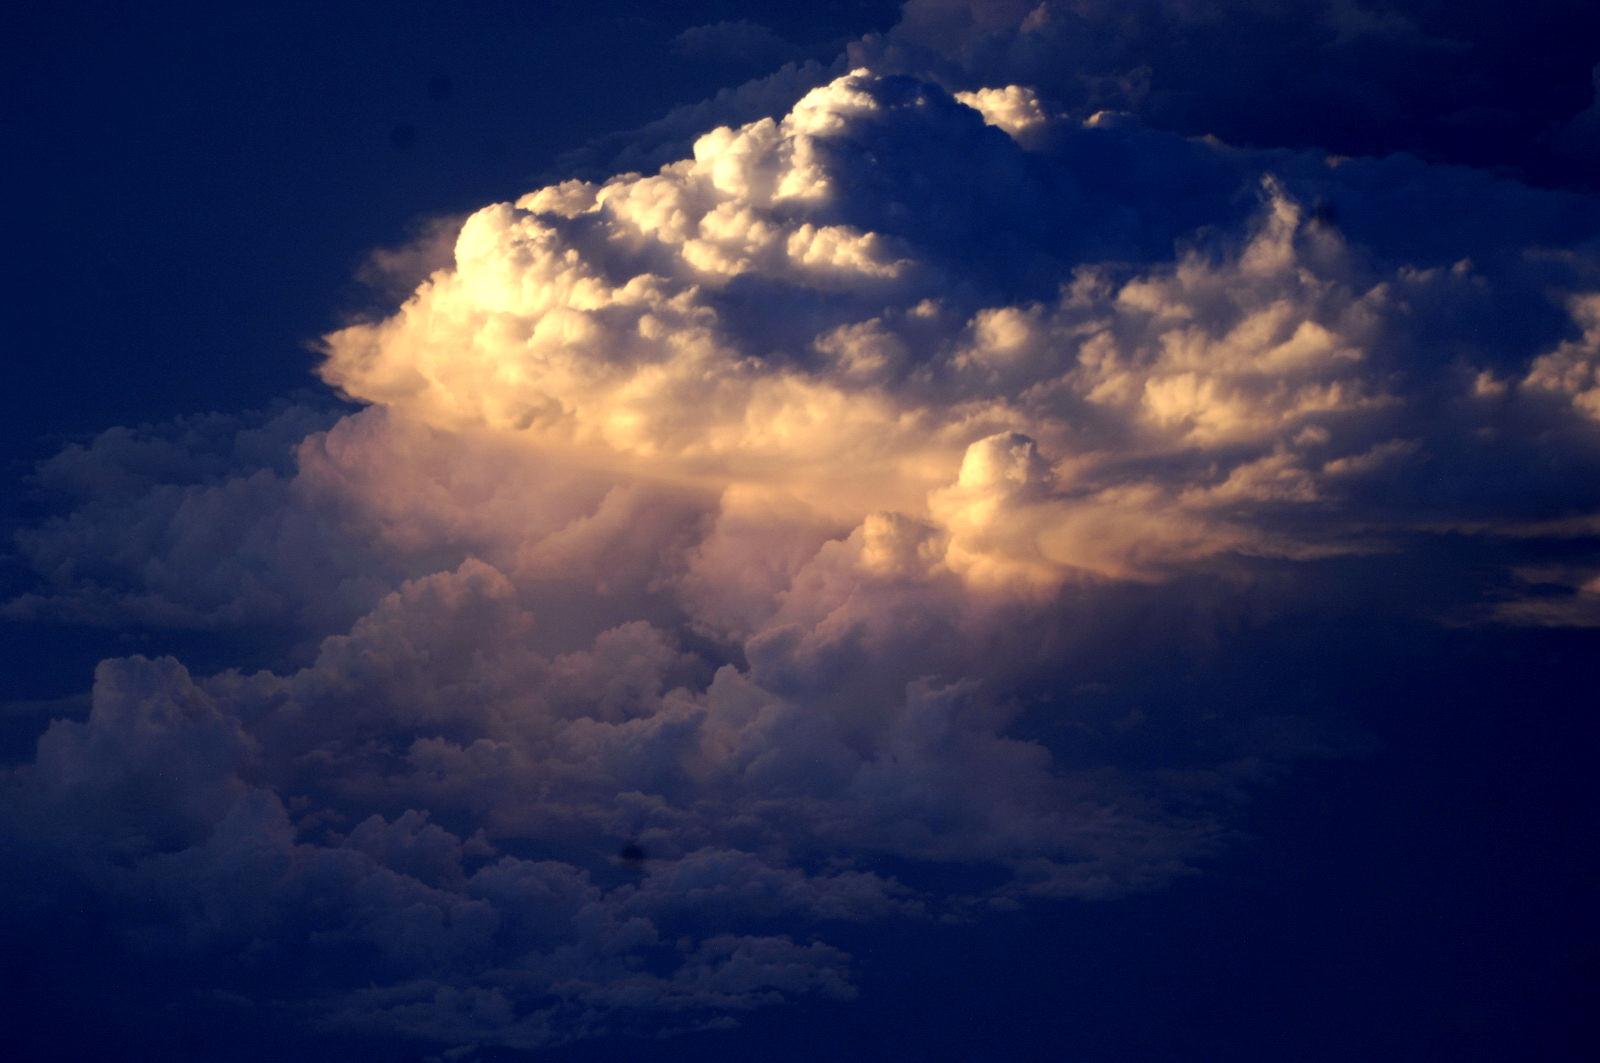 http://1.bp.blogspot.com/-HfXwusKxp3s/TgUBW8zlerI/AAAAAAAAAjE/1341pYwS3Zg/s1600/moon_cloud_b_05.JPG